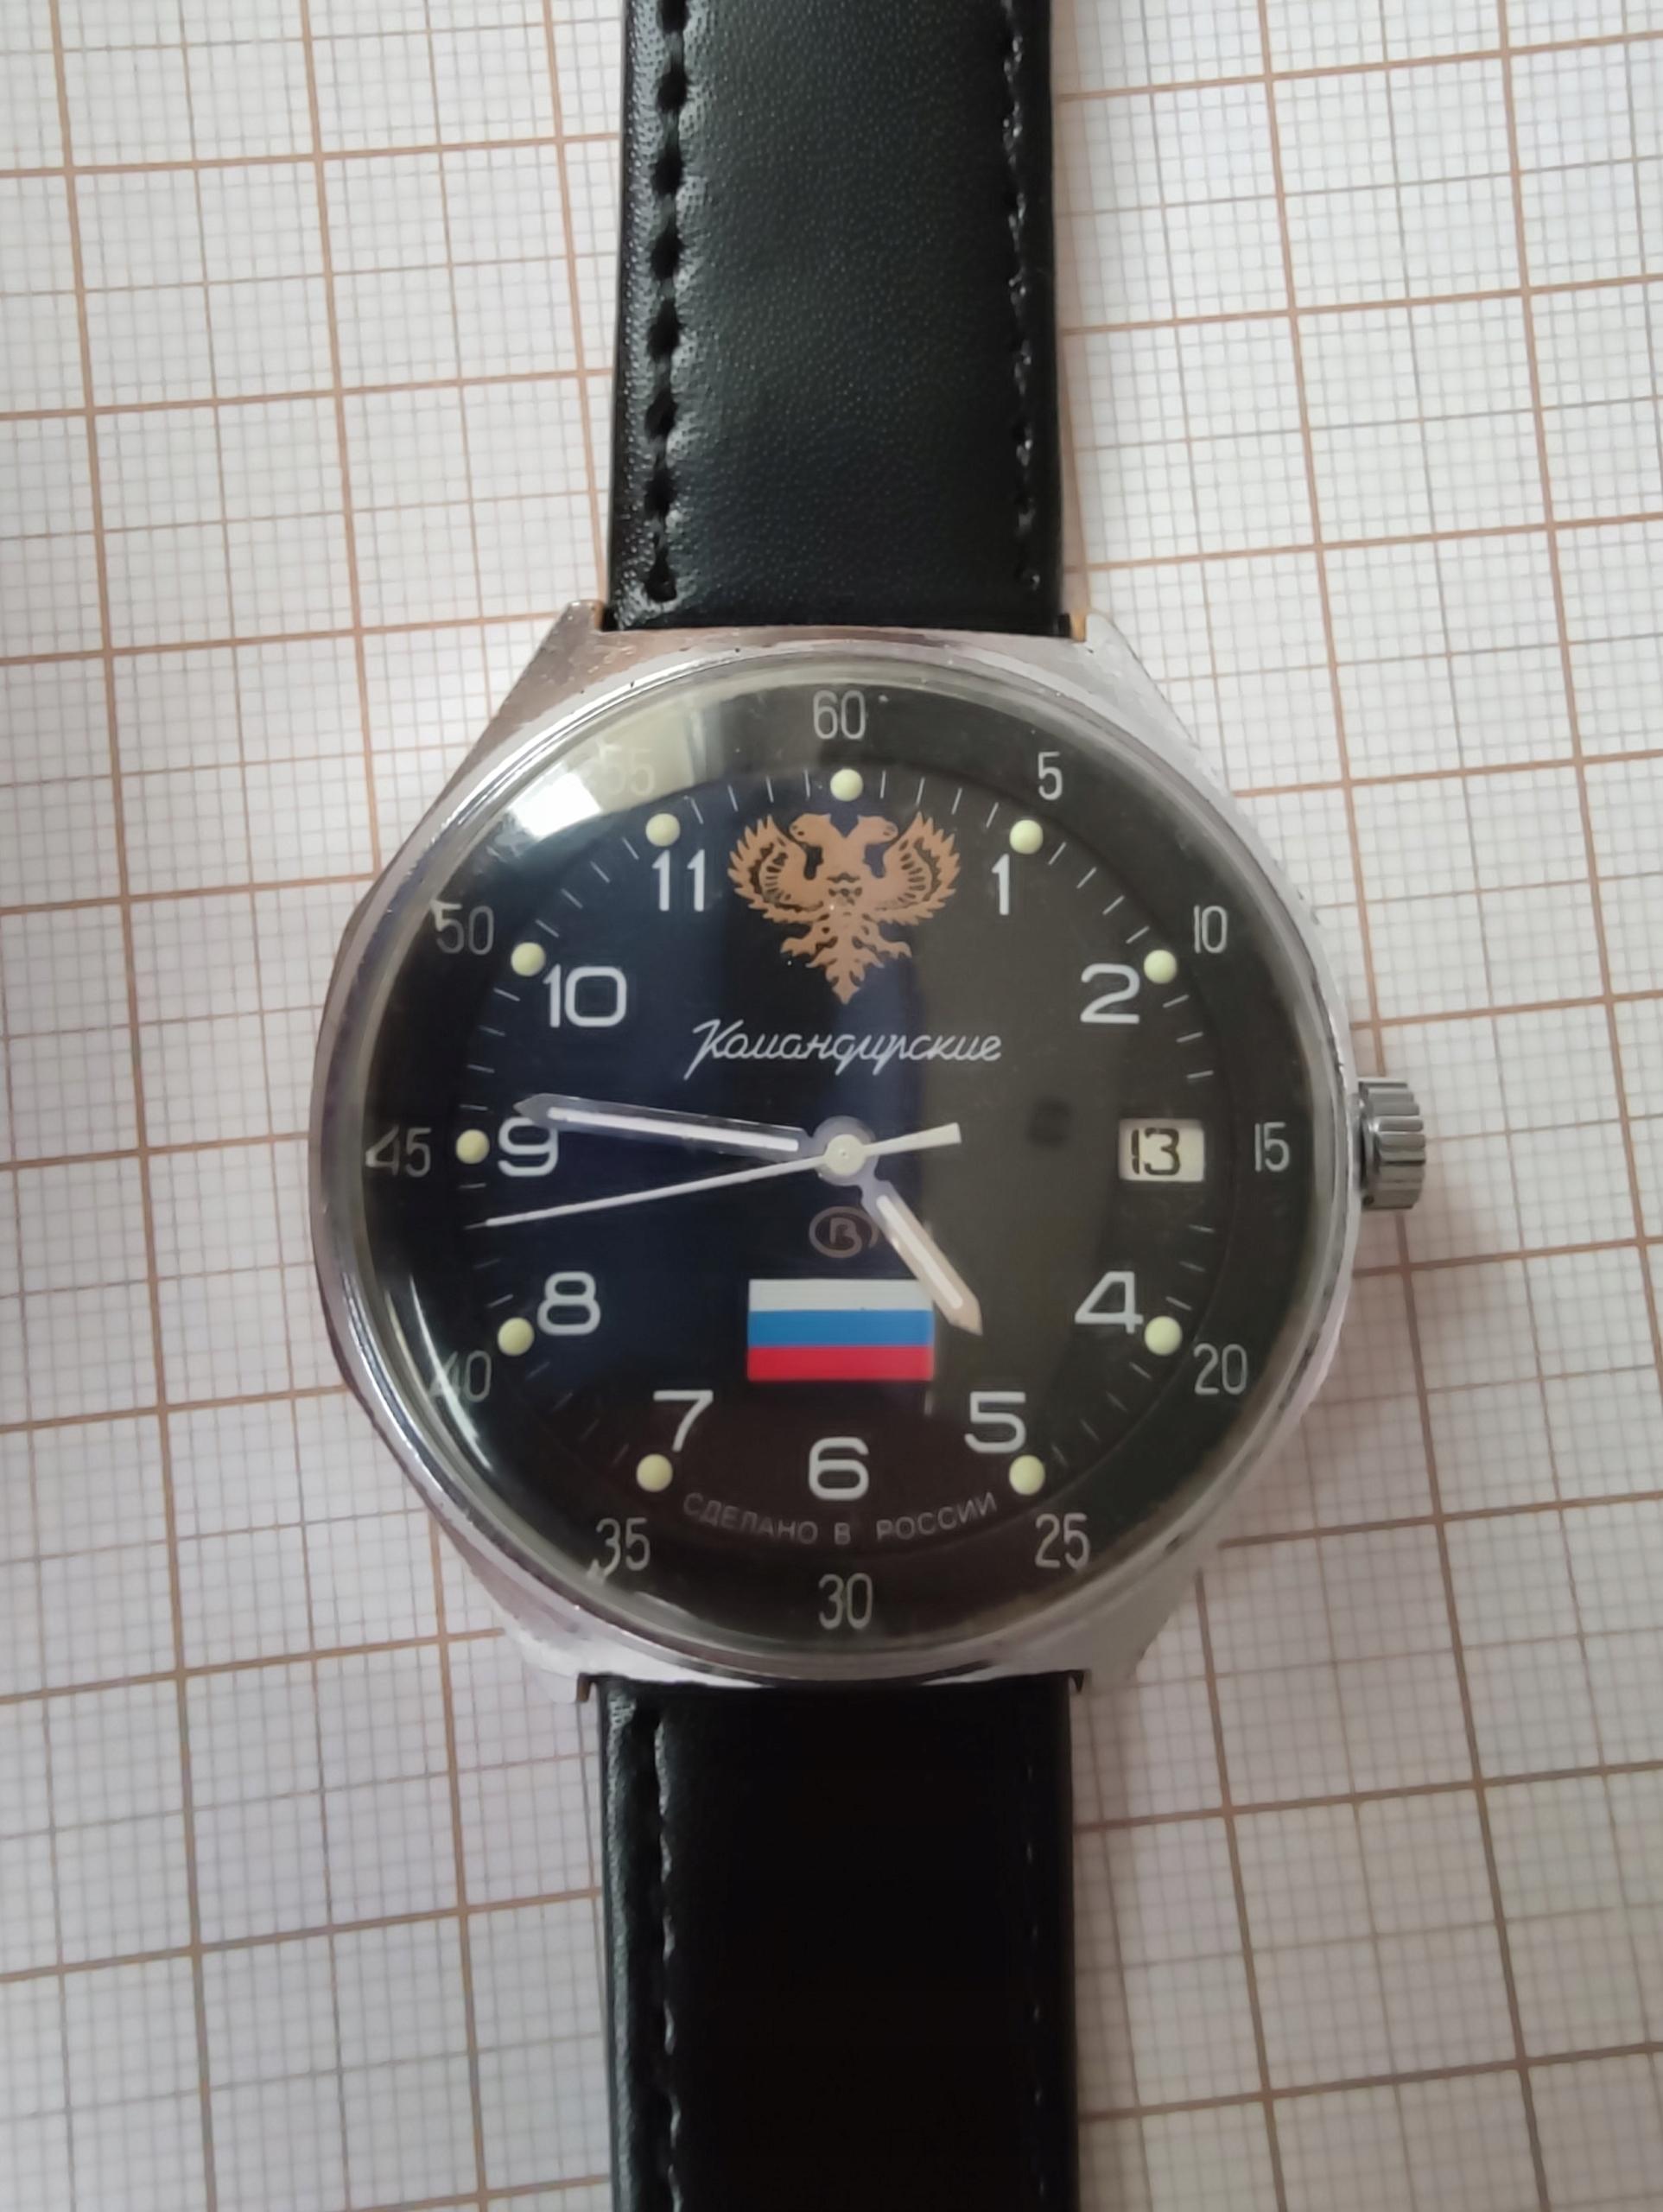 zegarek WOSTOCK Komandierskie 17 jewels